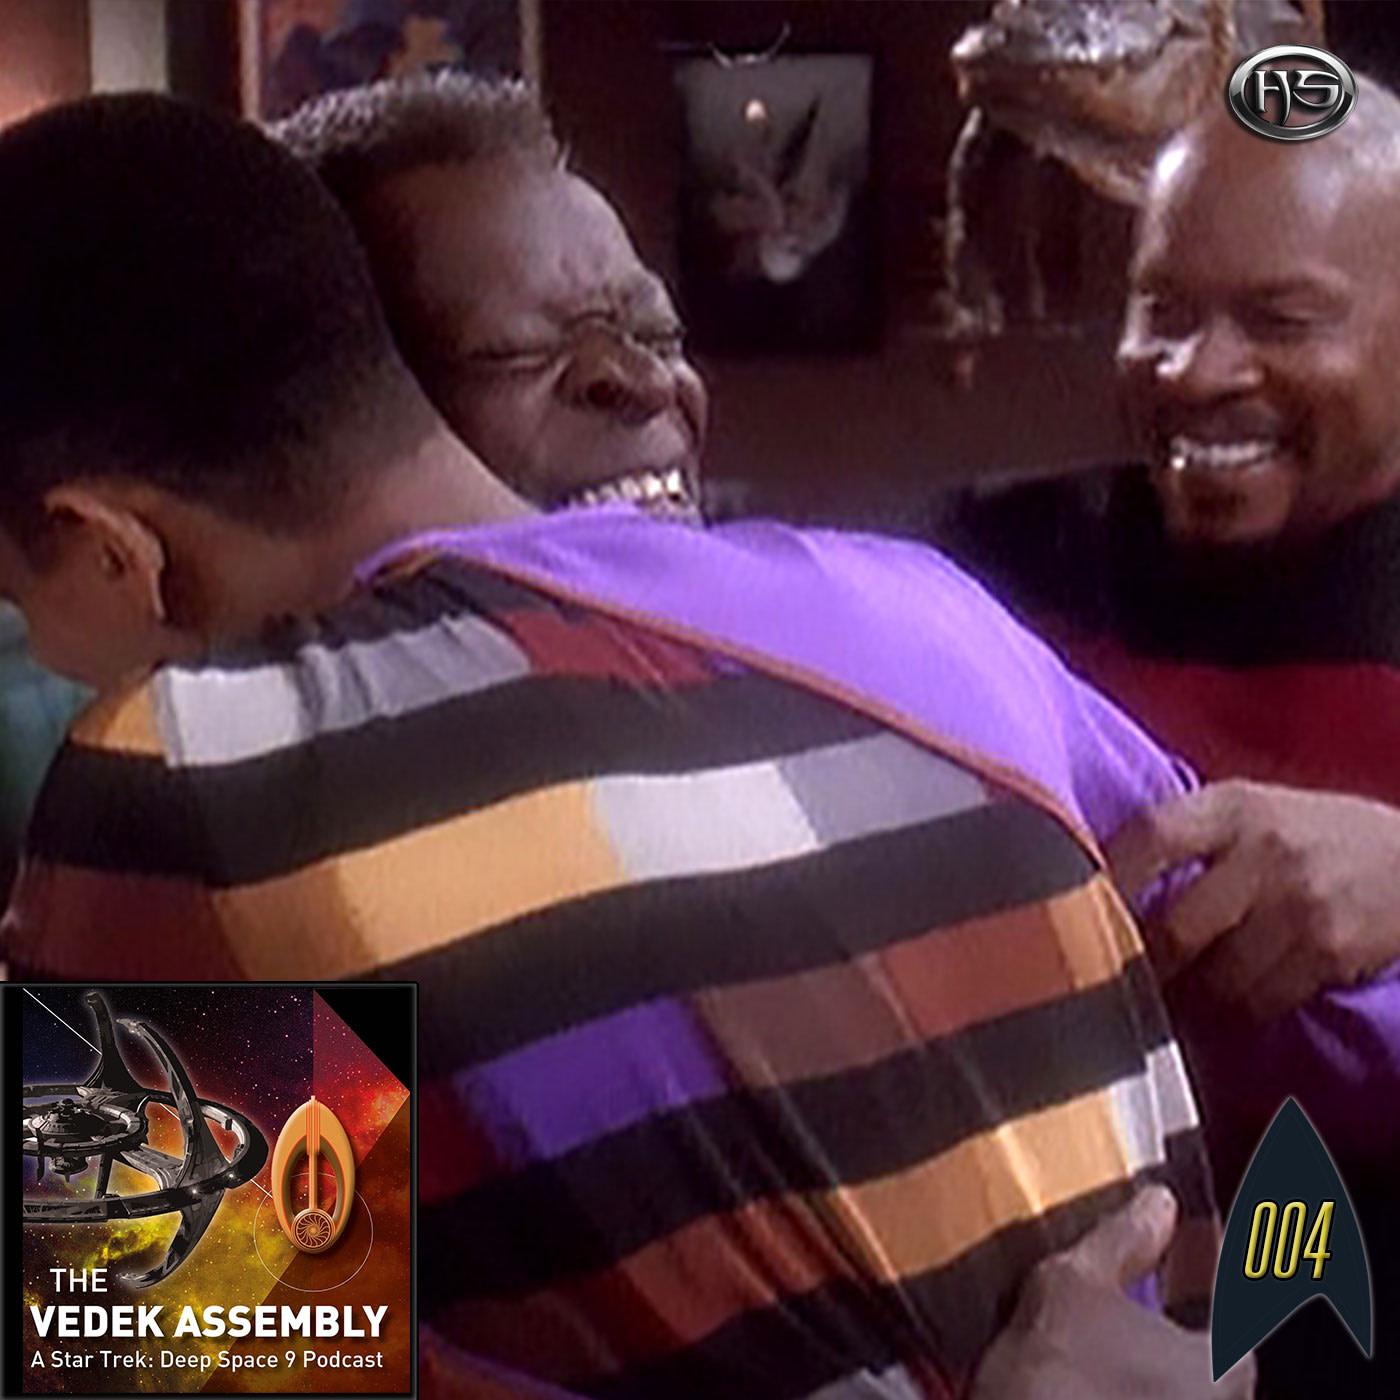 The Vedek Assembly Episode 4